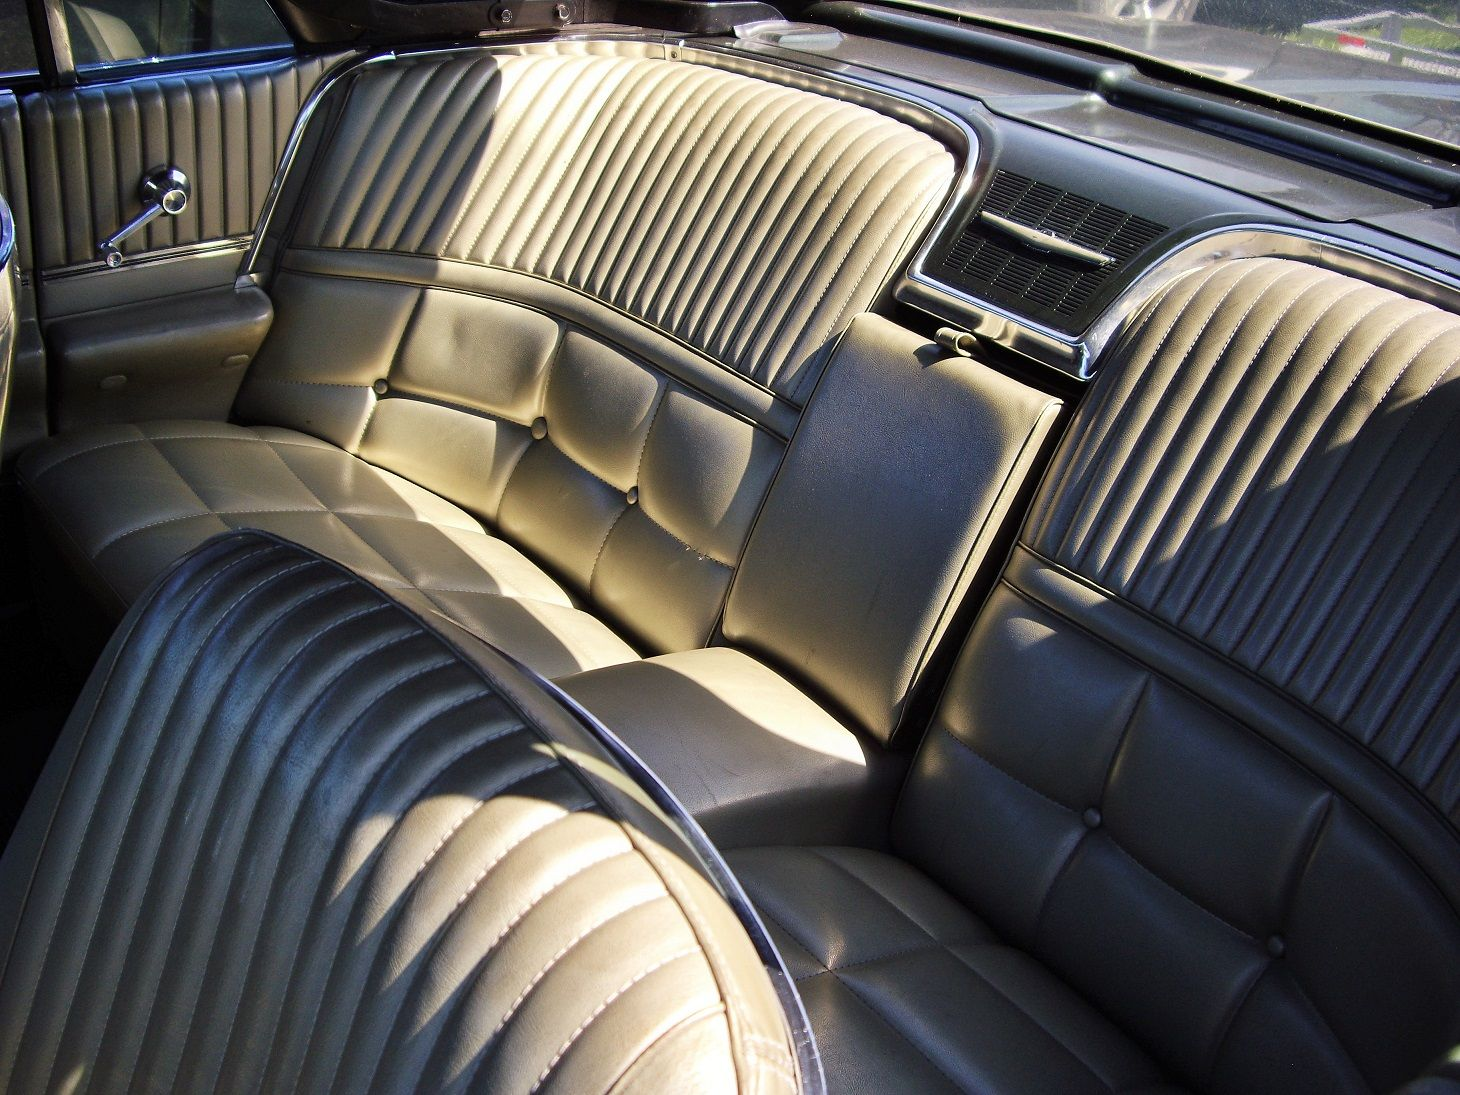 Awe Inspiring Rear Seat Of 1966 Thunderbird Car Upholstery Upholstery Ibusinesslaw Wood Chair Design Ideas Ibusinesslaworg